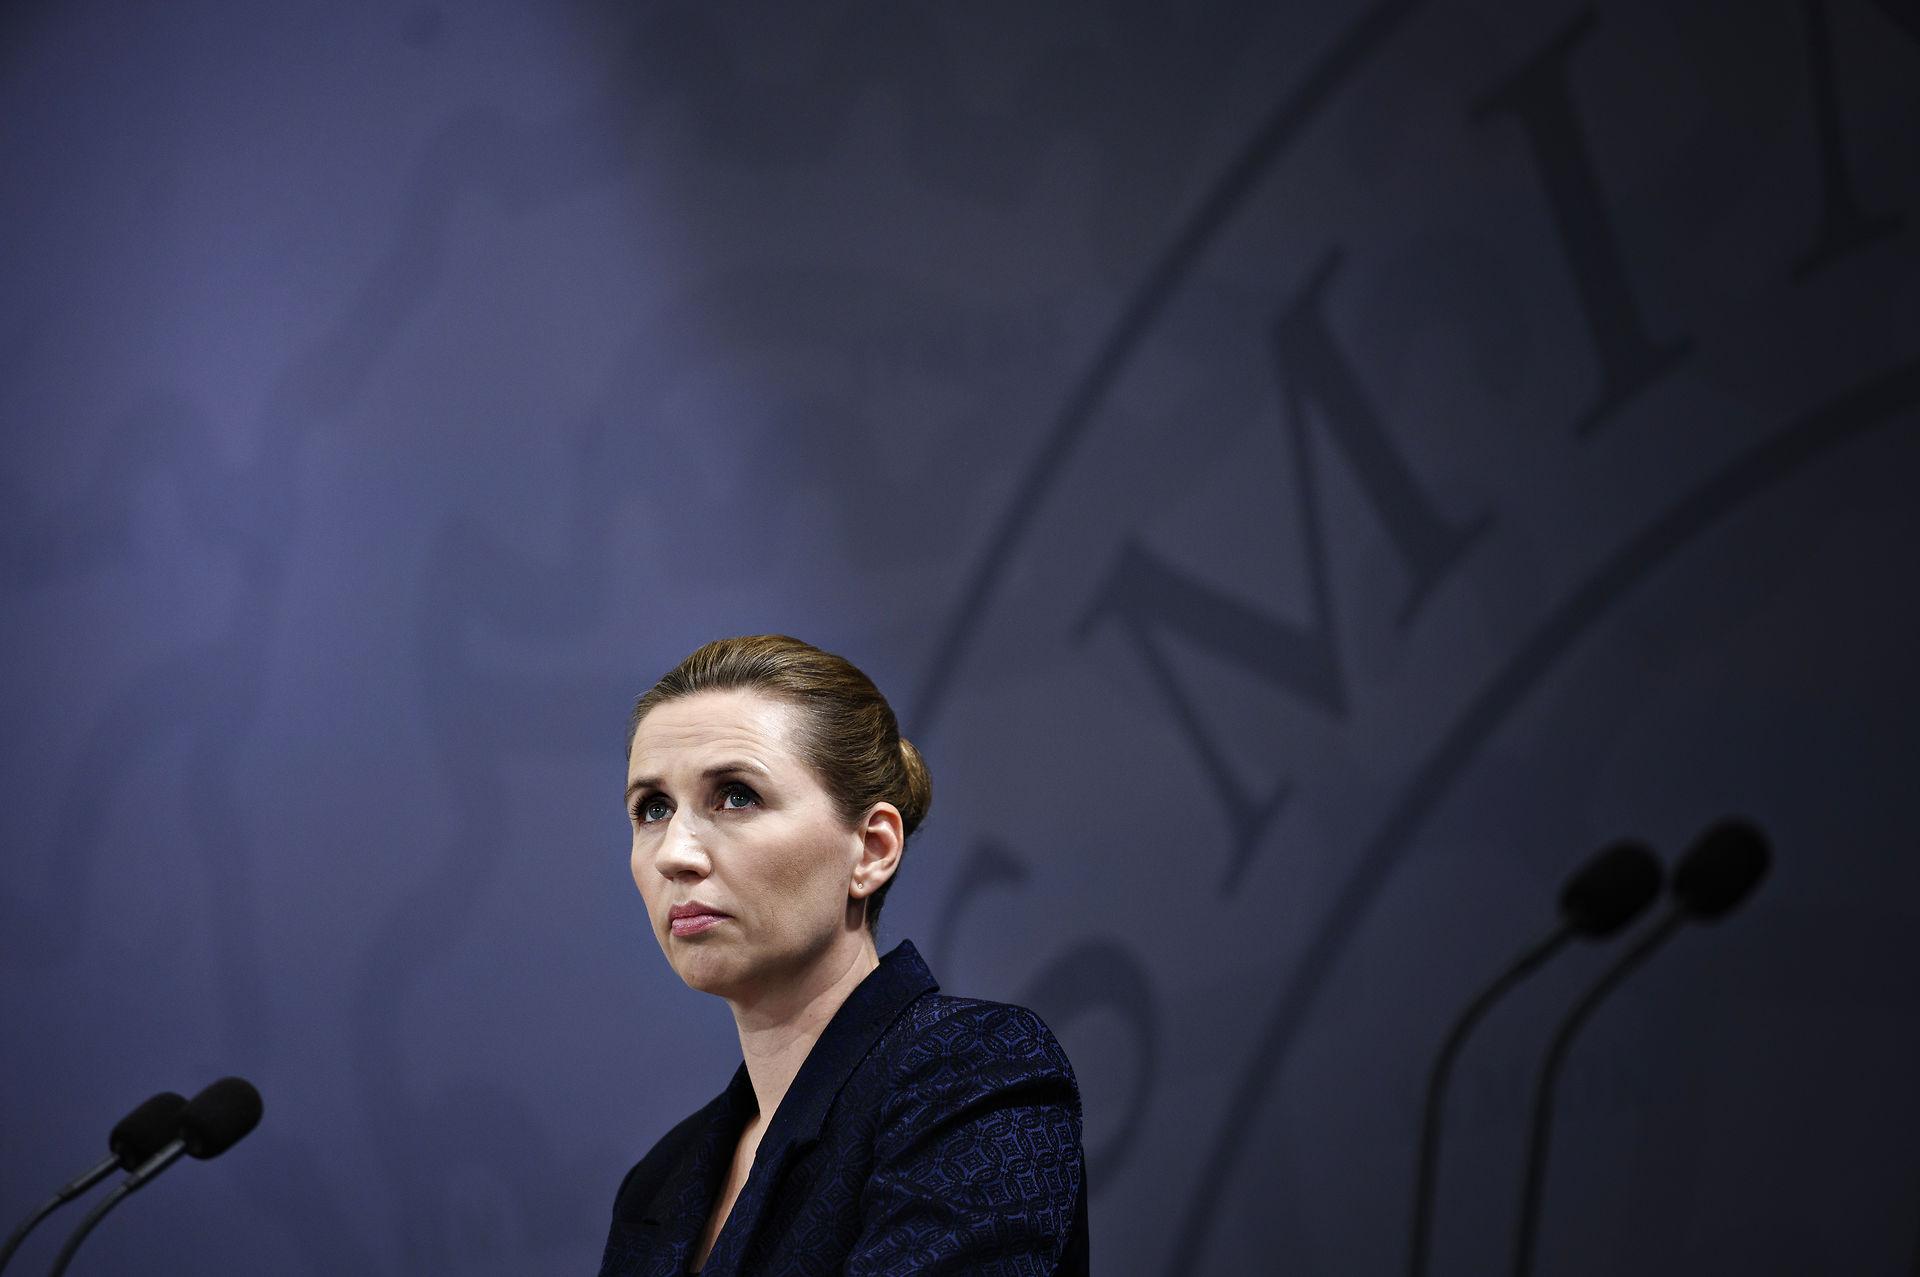 Bjarne Corydon i RÆSONs nye trykte nummer: Der er tale om et brud, ikke bare med Thorning-regeringen, men med de seneste 30-40 års konsensus